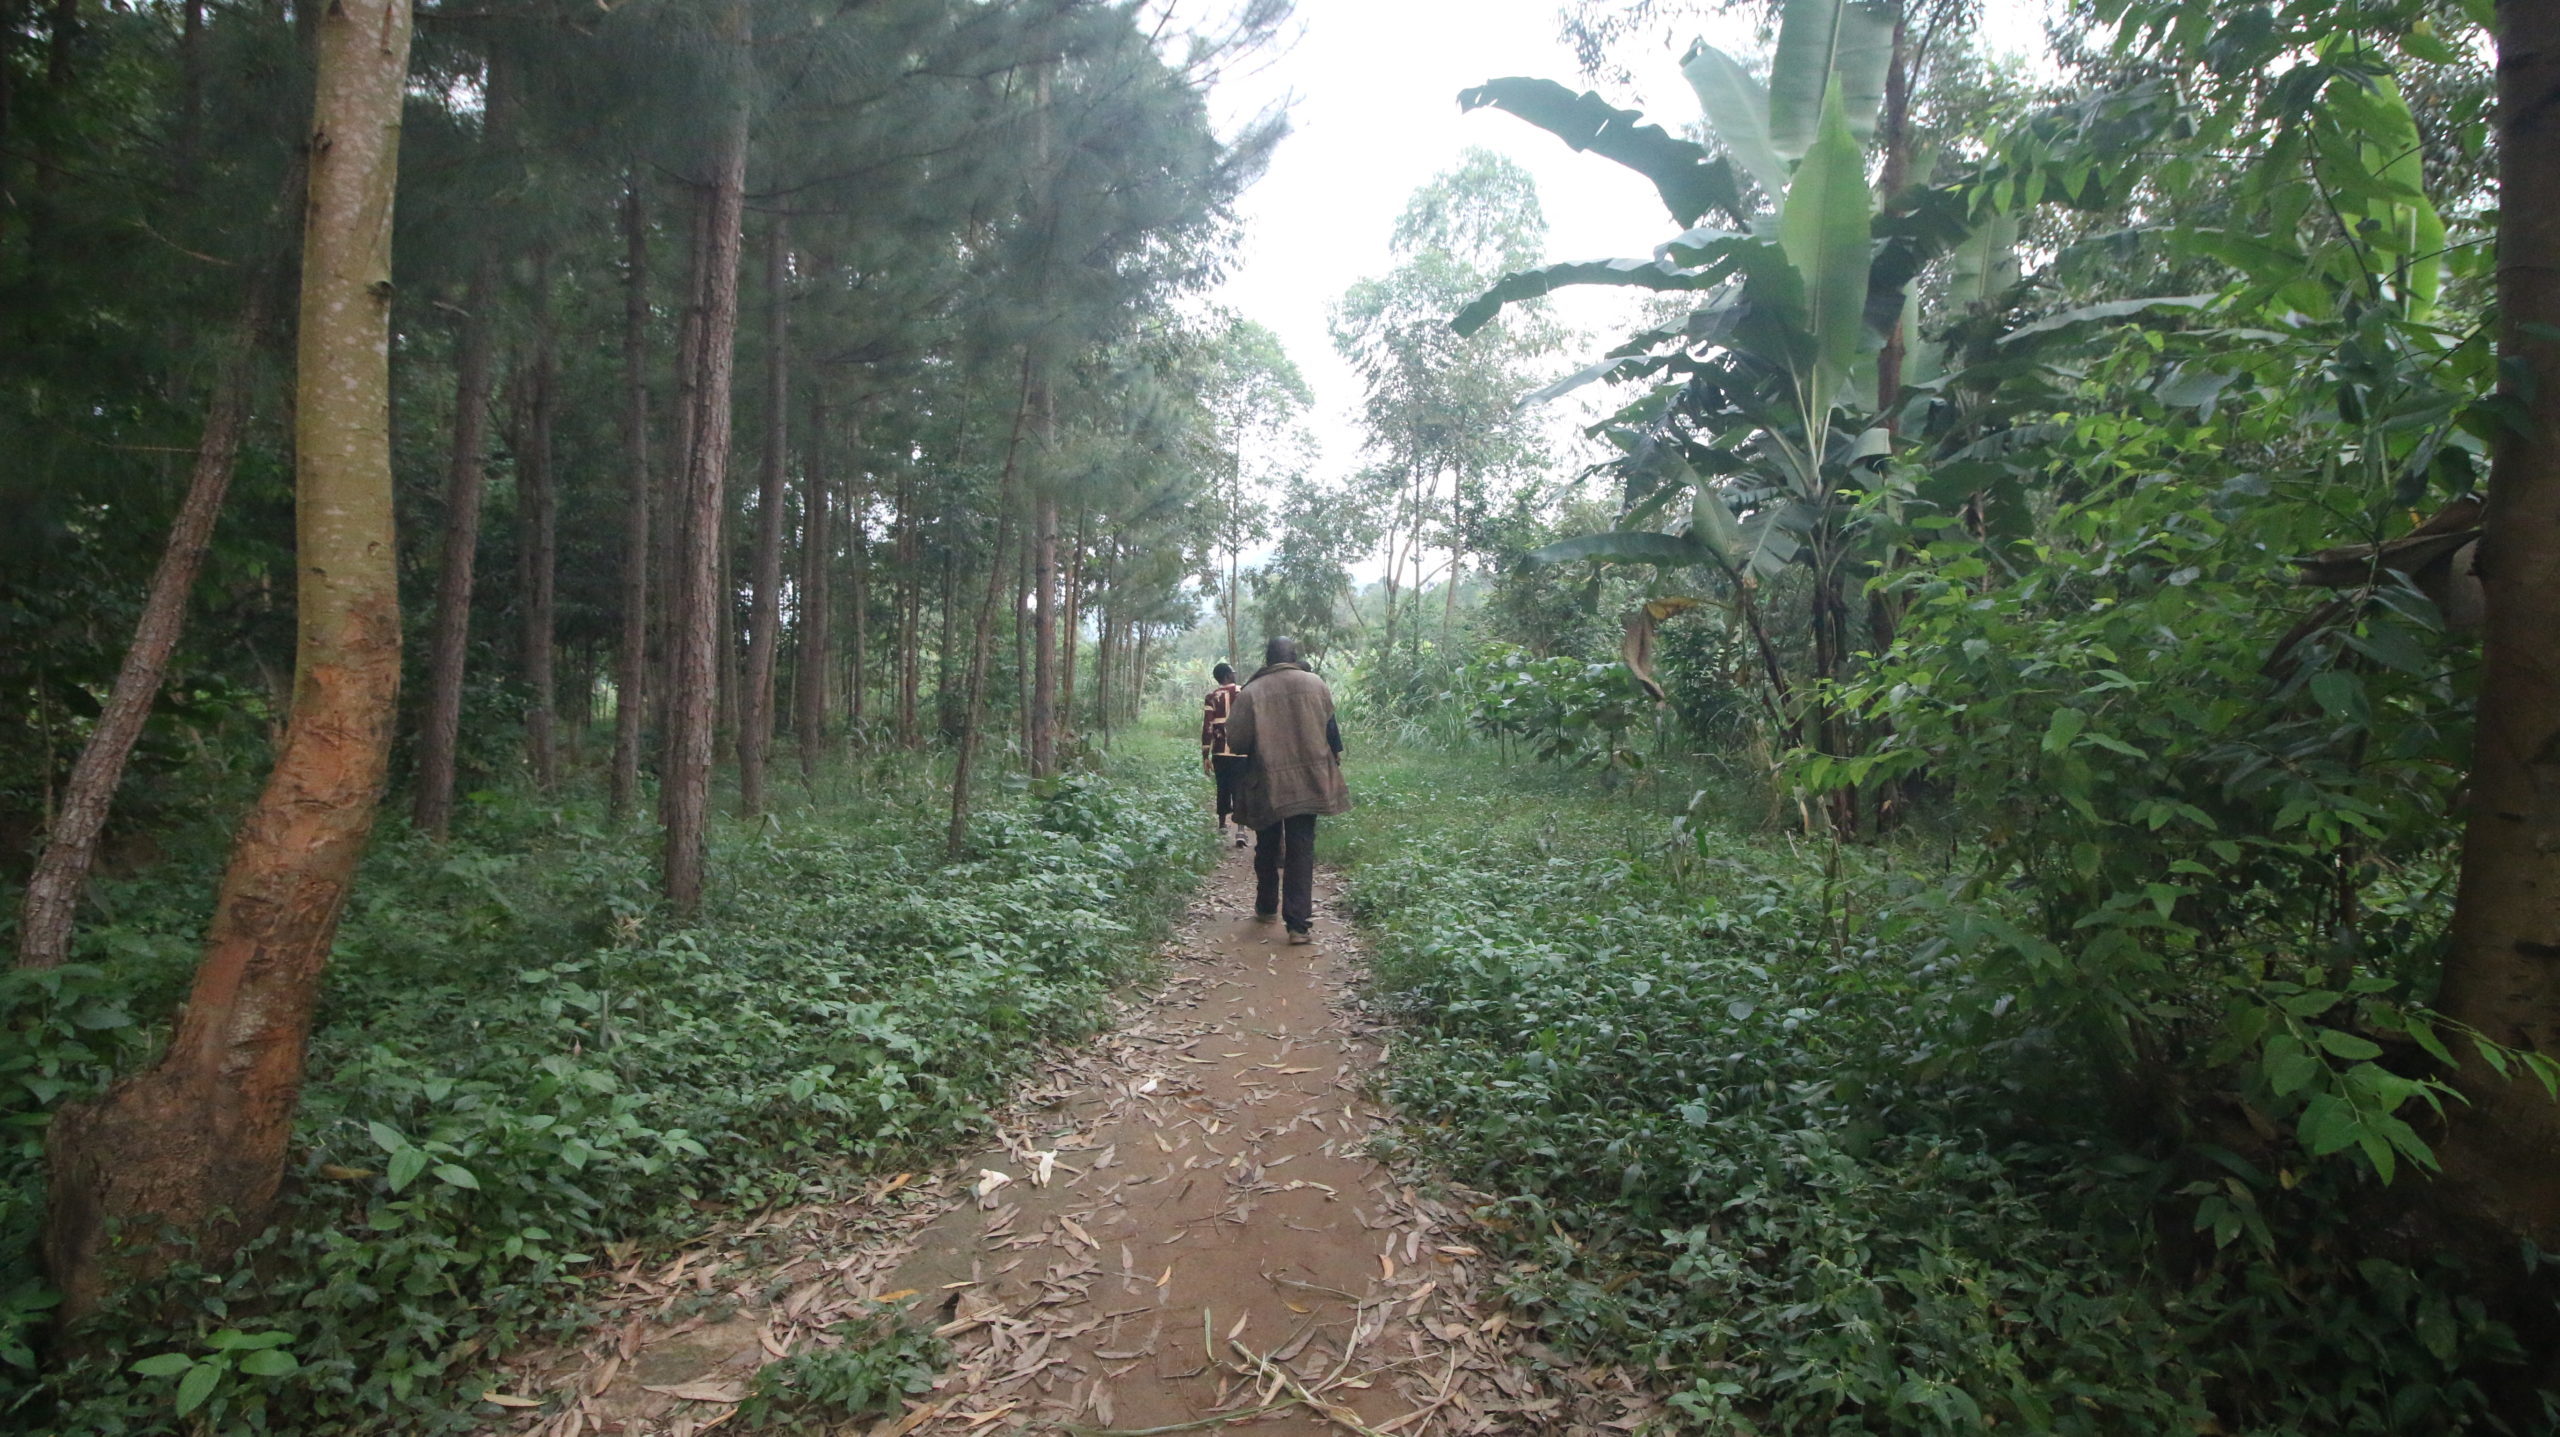 Mt. Elgon Landslides Survivors Plant 30,000 Trees through a Village Savings Group to Fight Climate Change